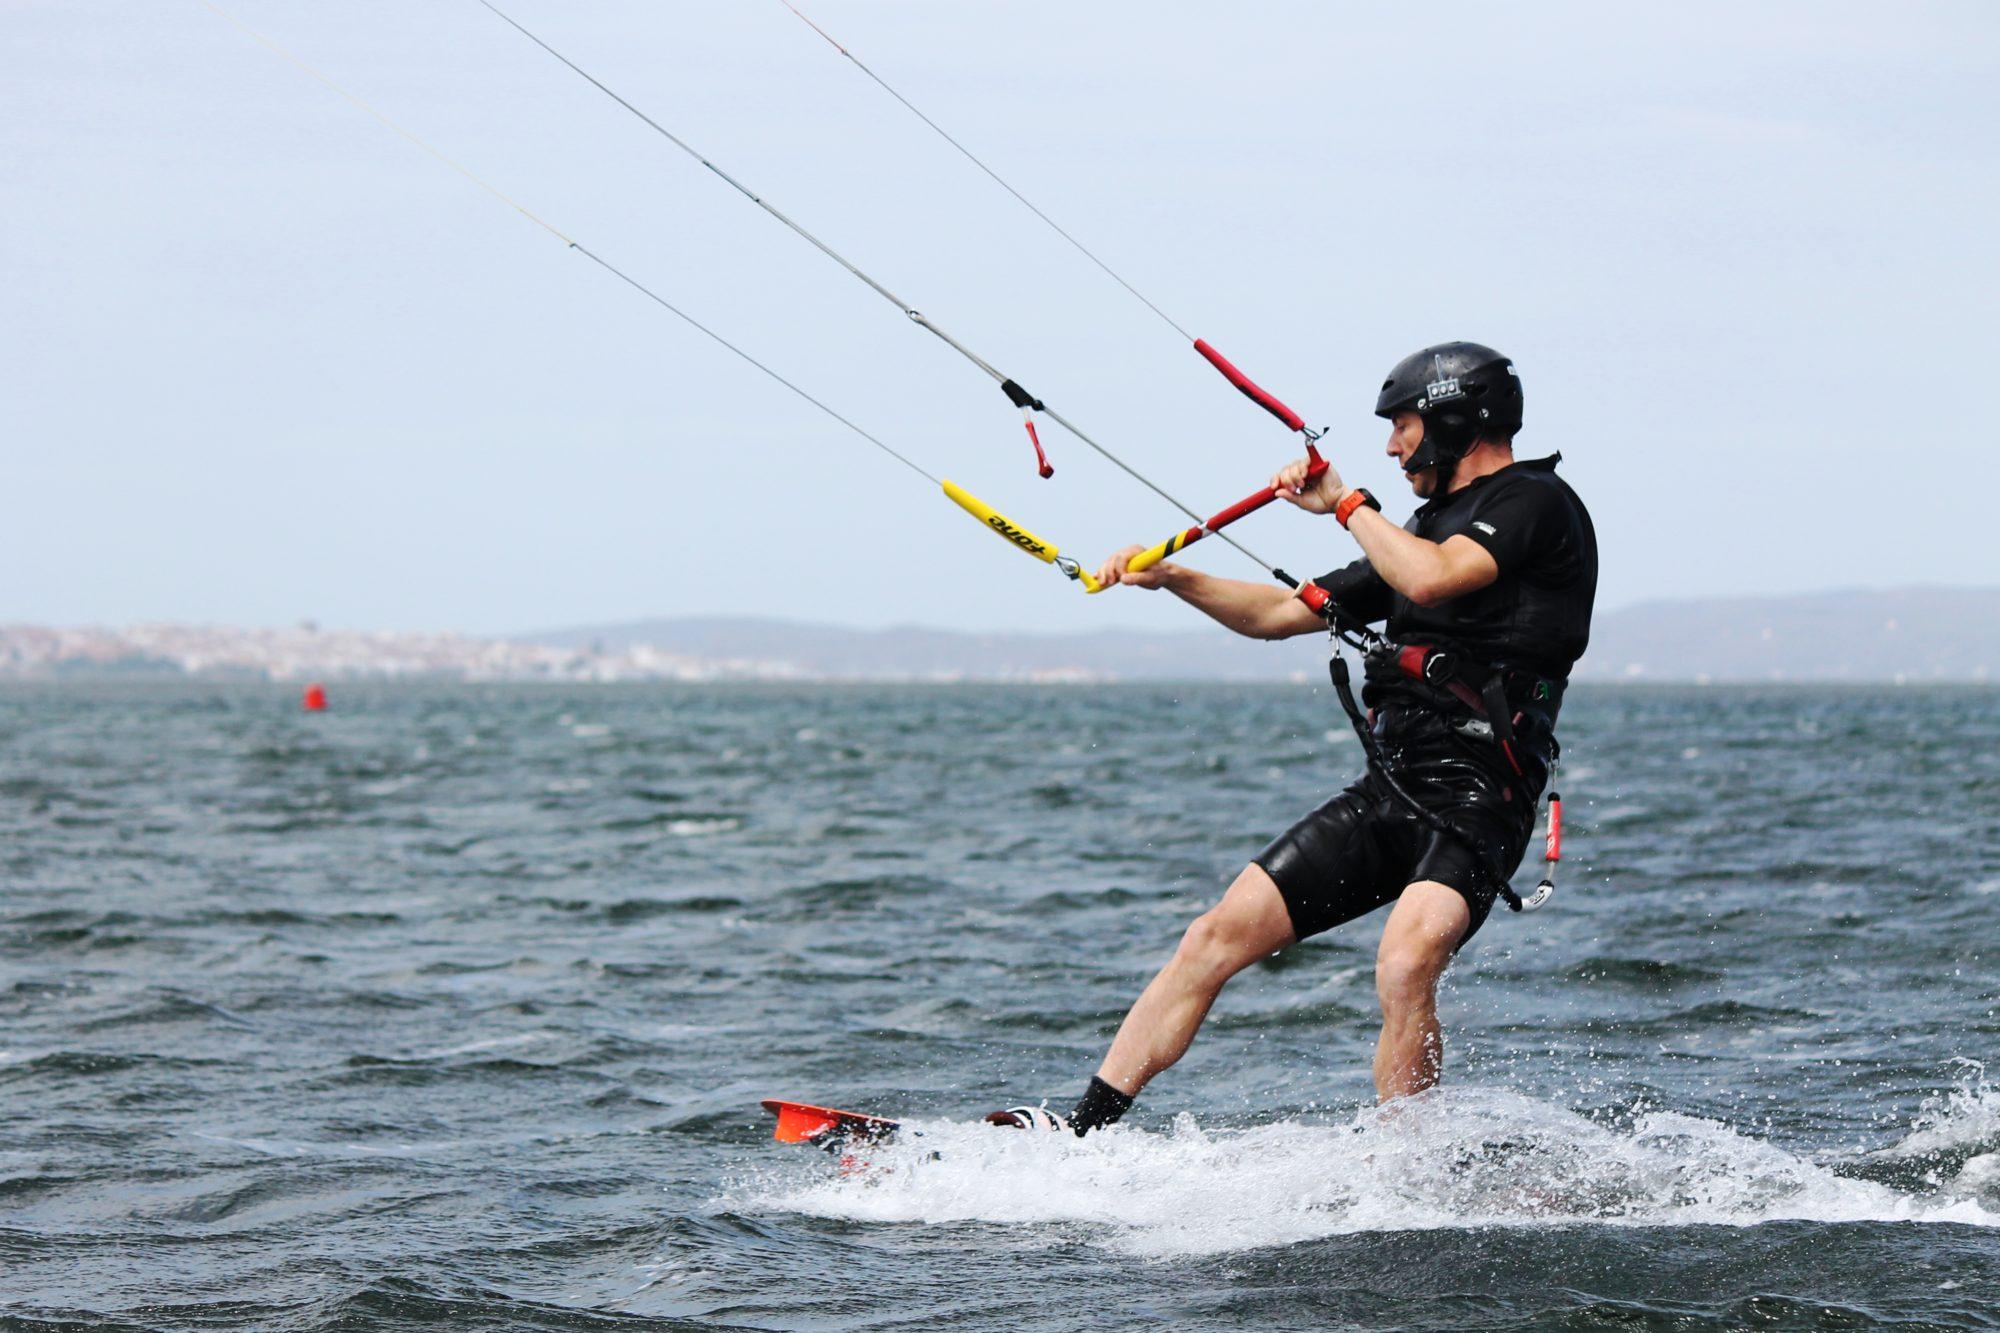 Punta Trettu in Sardinia: Perfect kite beach for learning how to kitesurf! Learn Kitesurfing in Punta Trettu